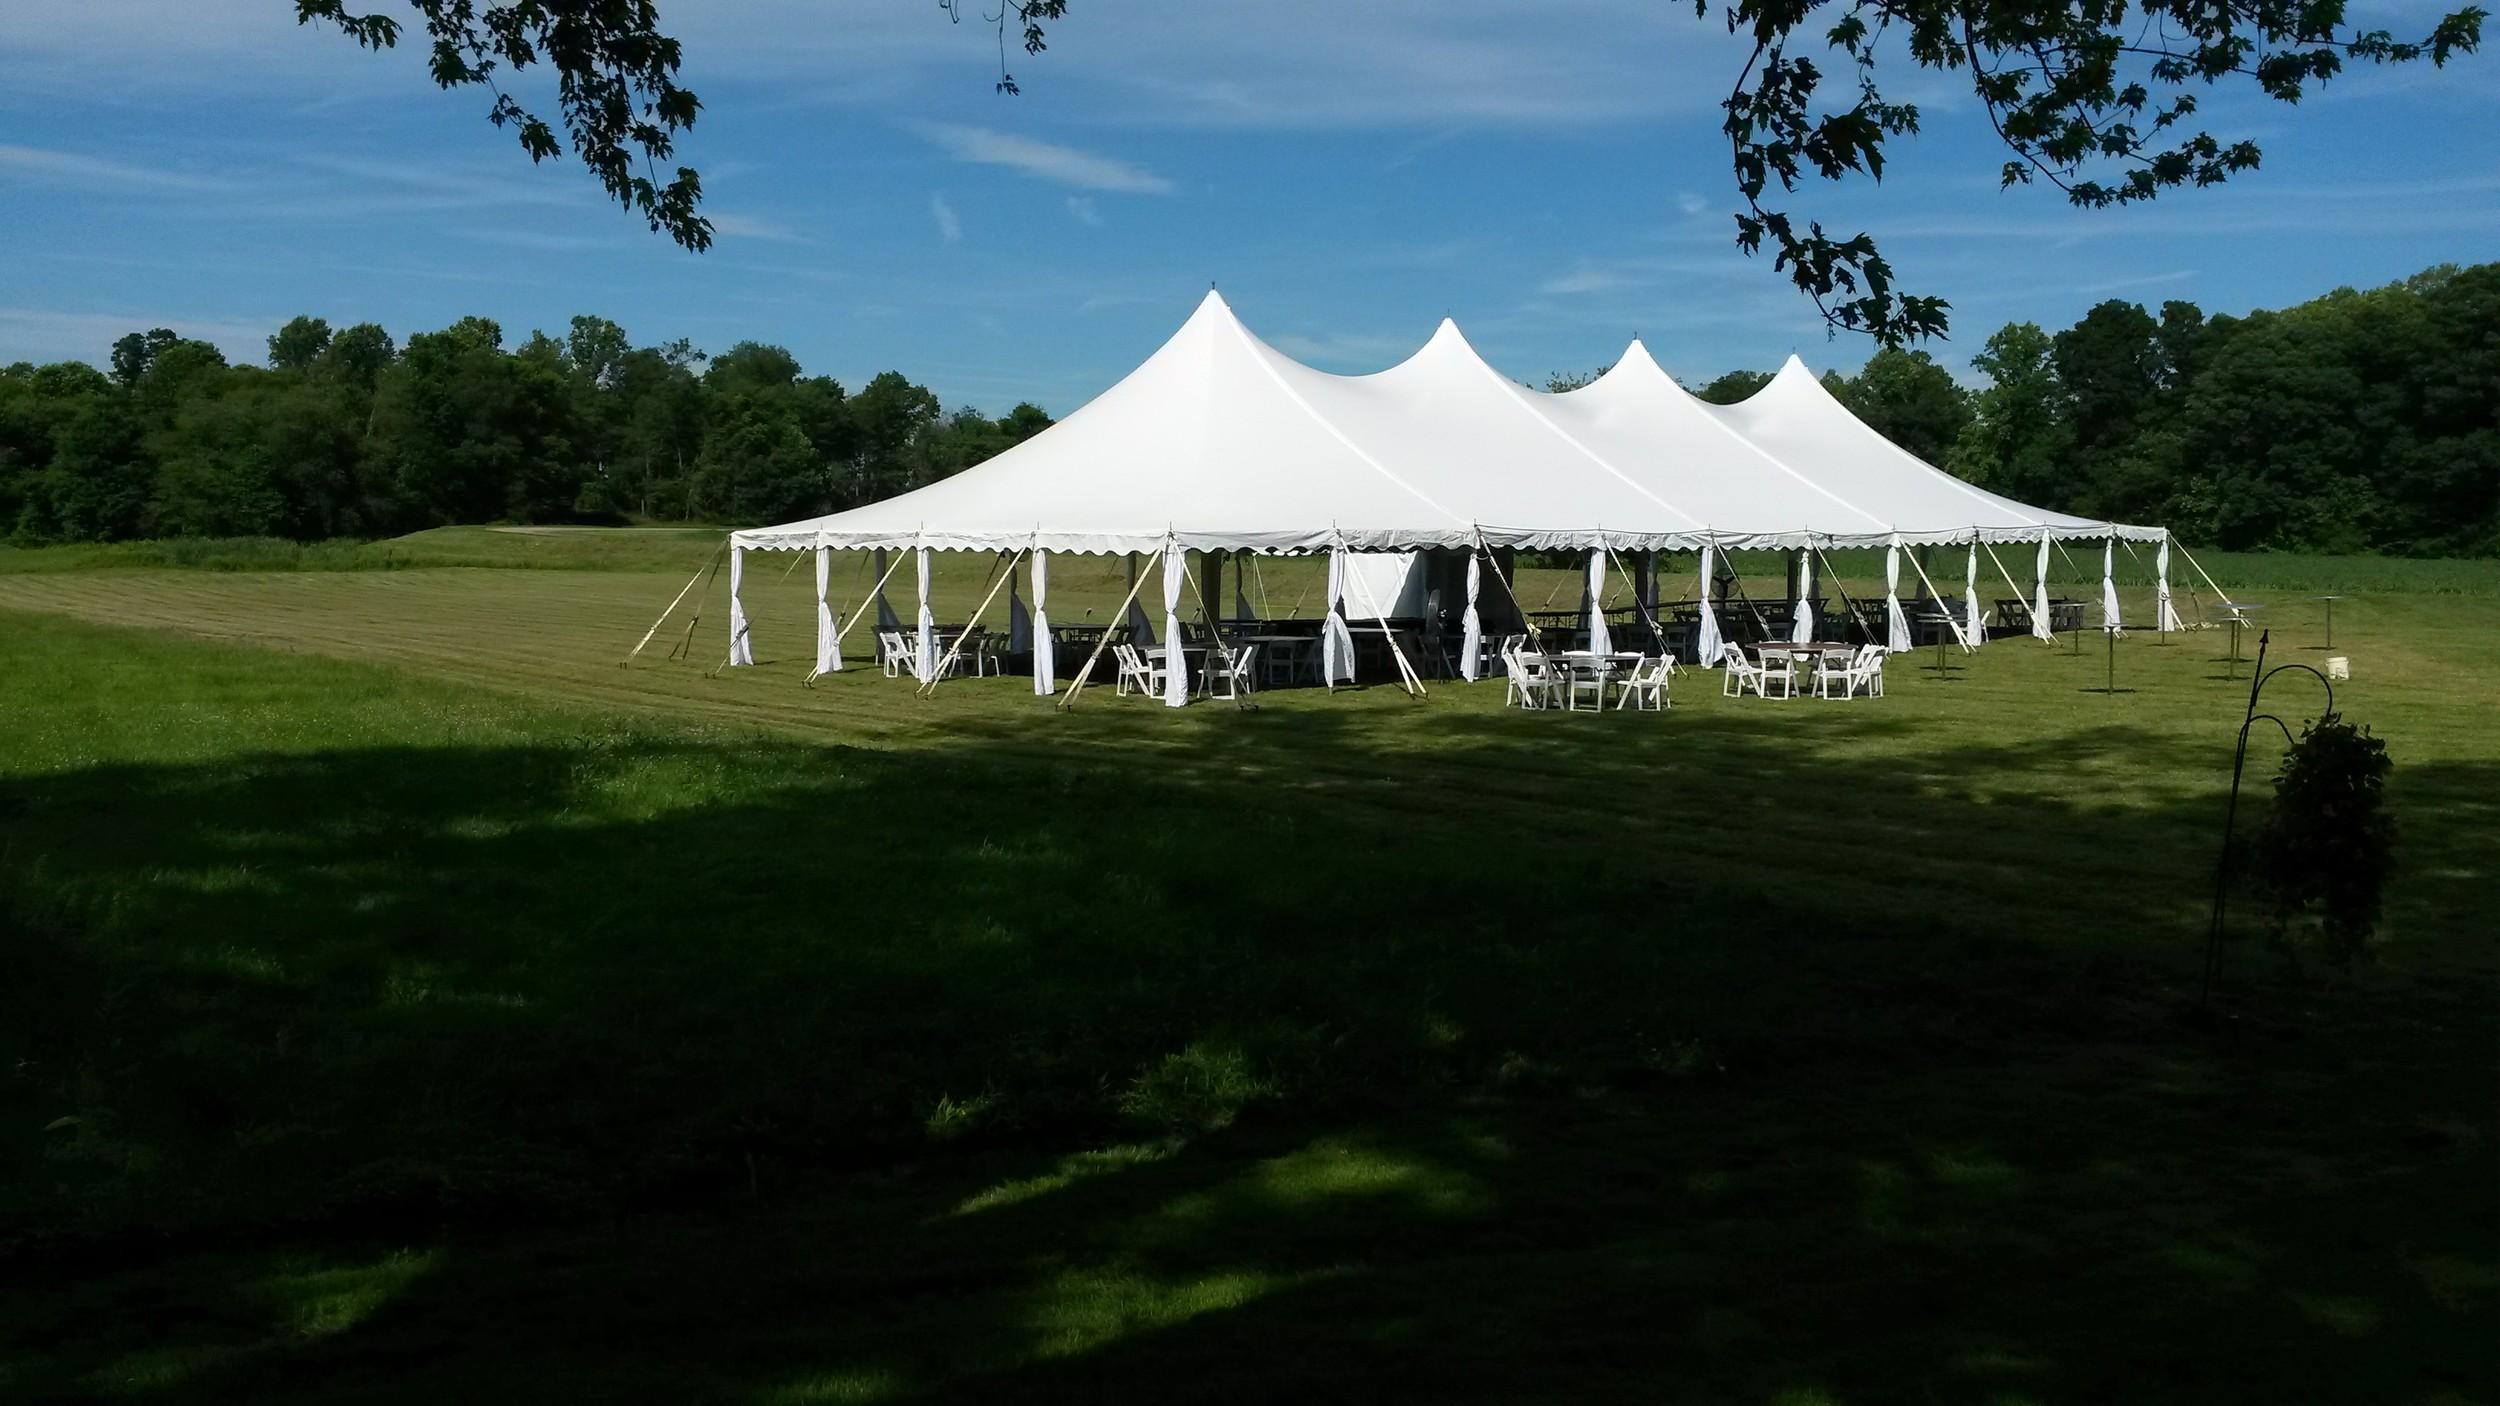 40x100 white tent with leg drapes